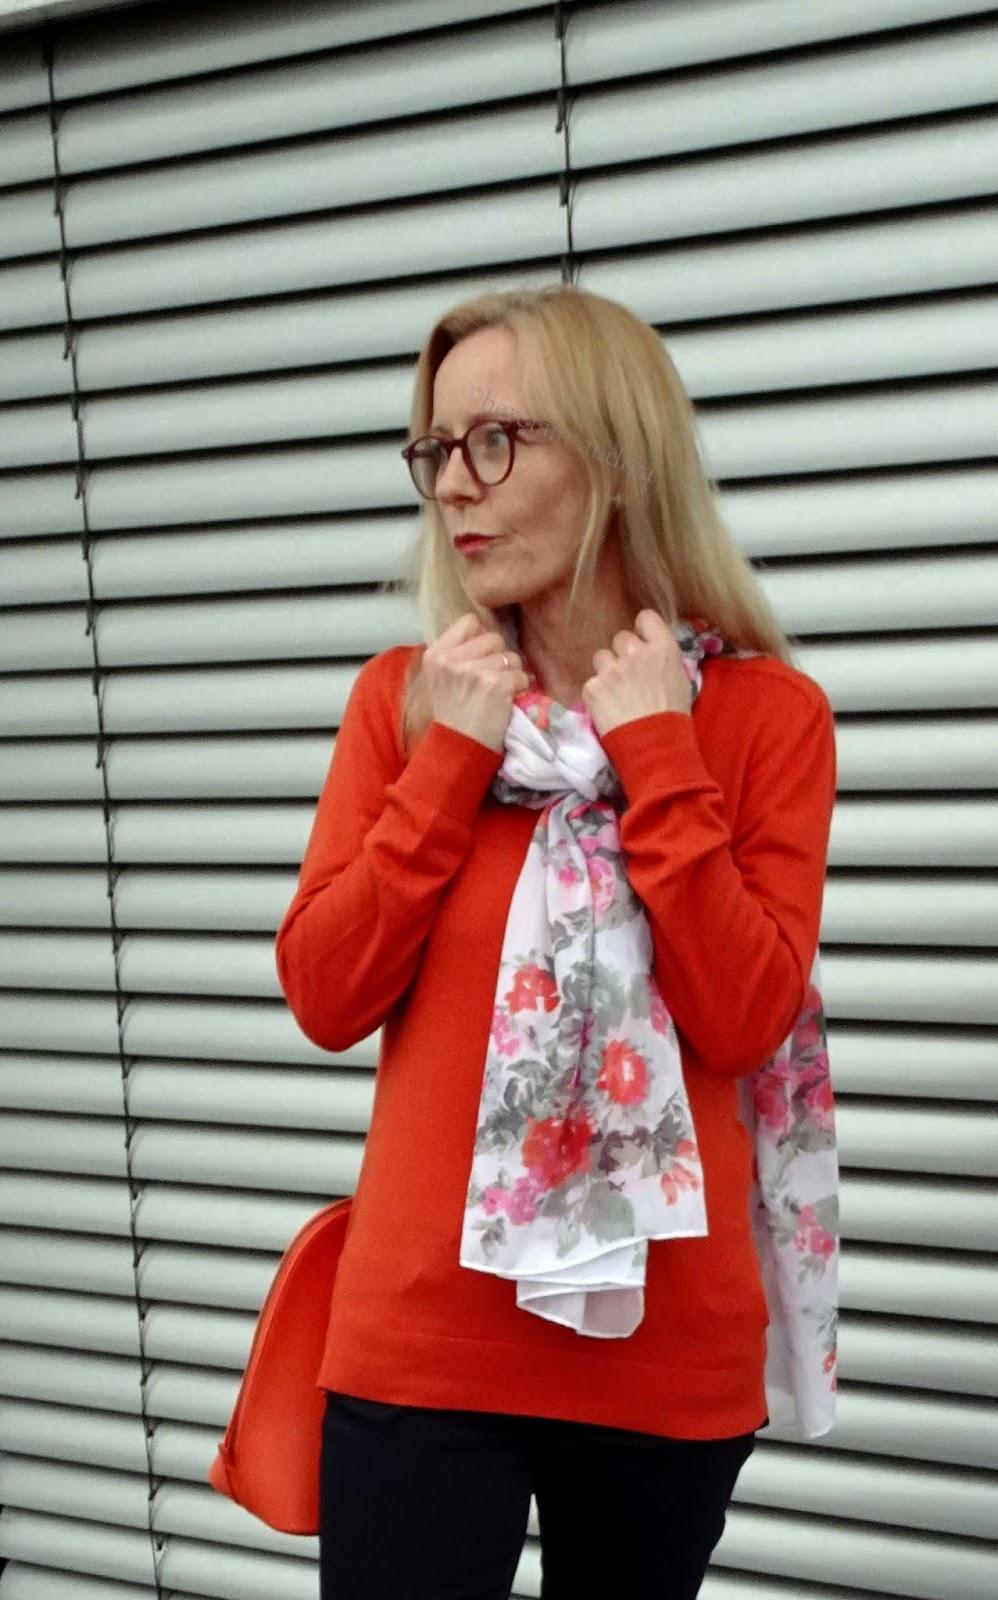 Trendfarbe Lila - der Look in Violett! - andysparkles.de